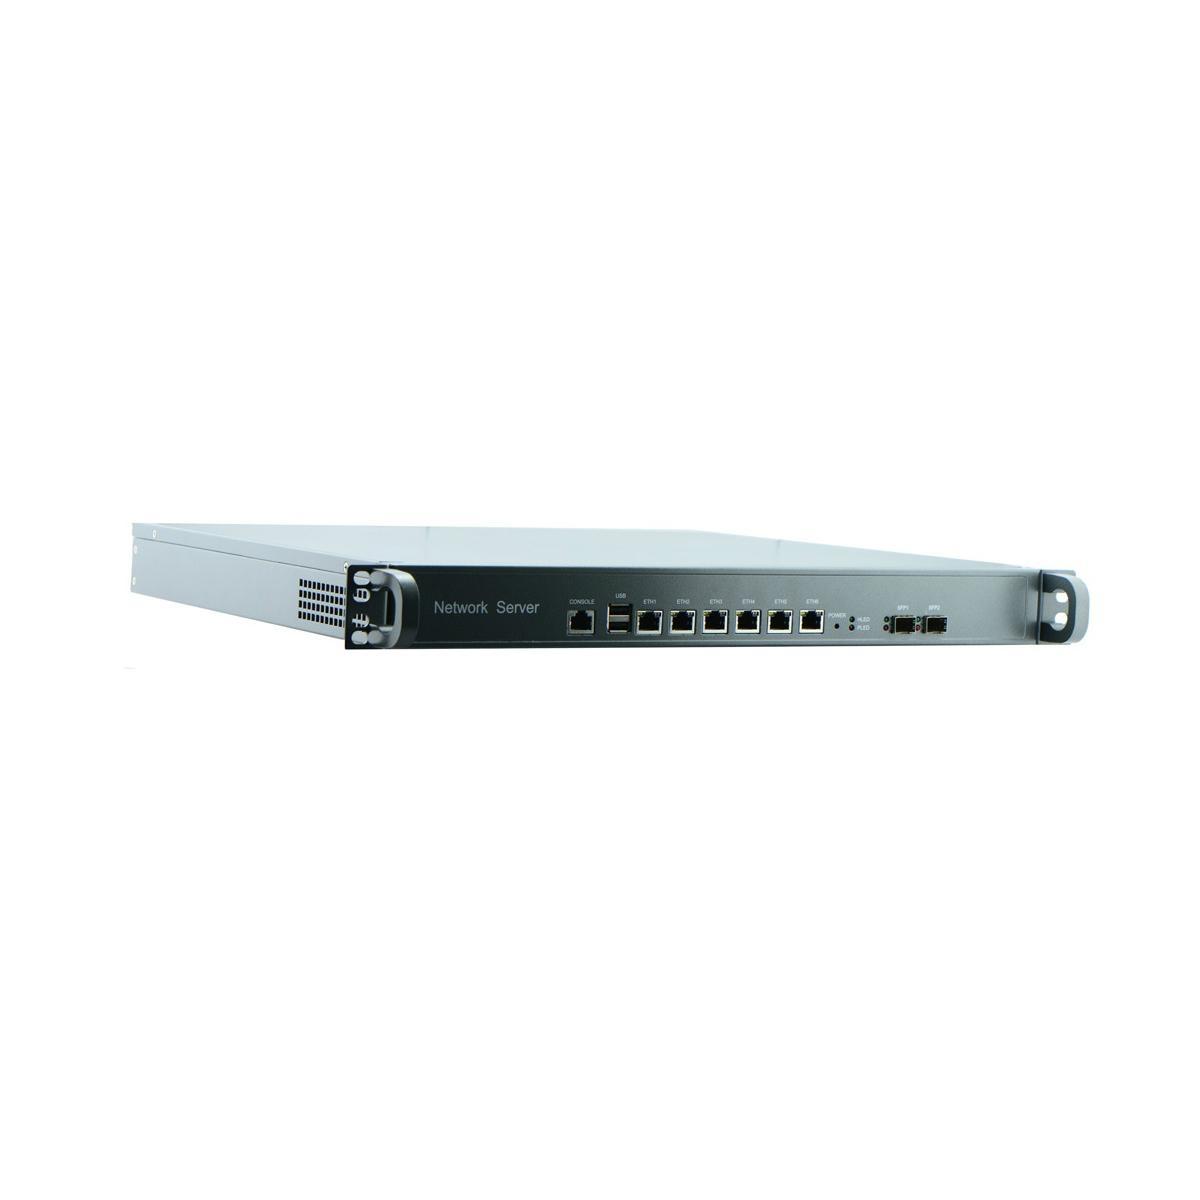 Intel Celeron C1037U 1U Rackmount Barebone for Network Security Application with 2